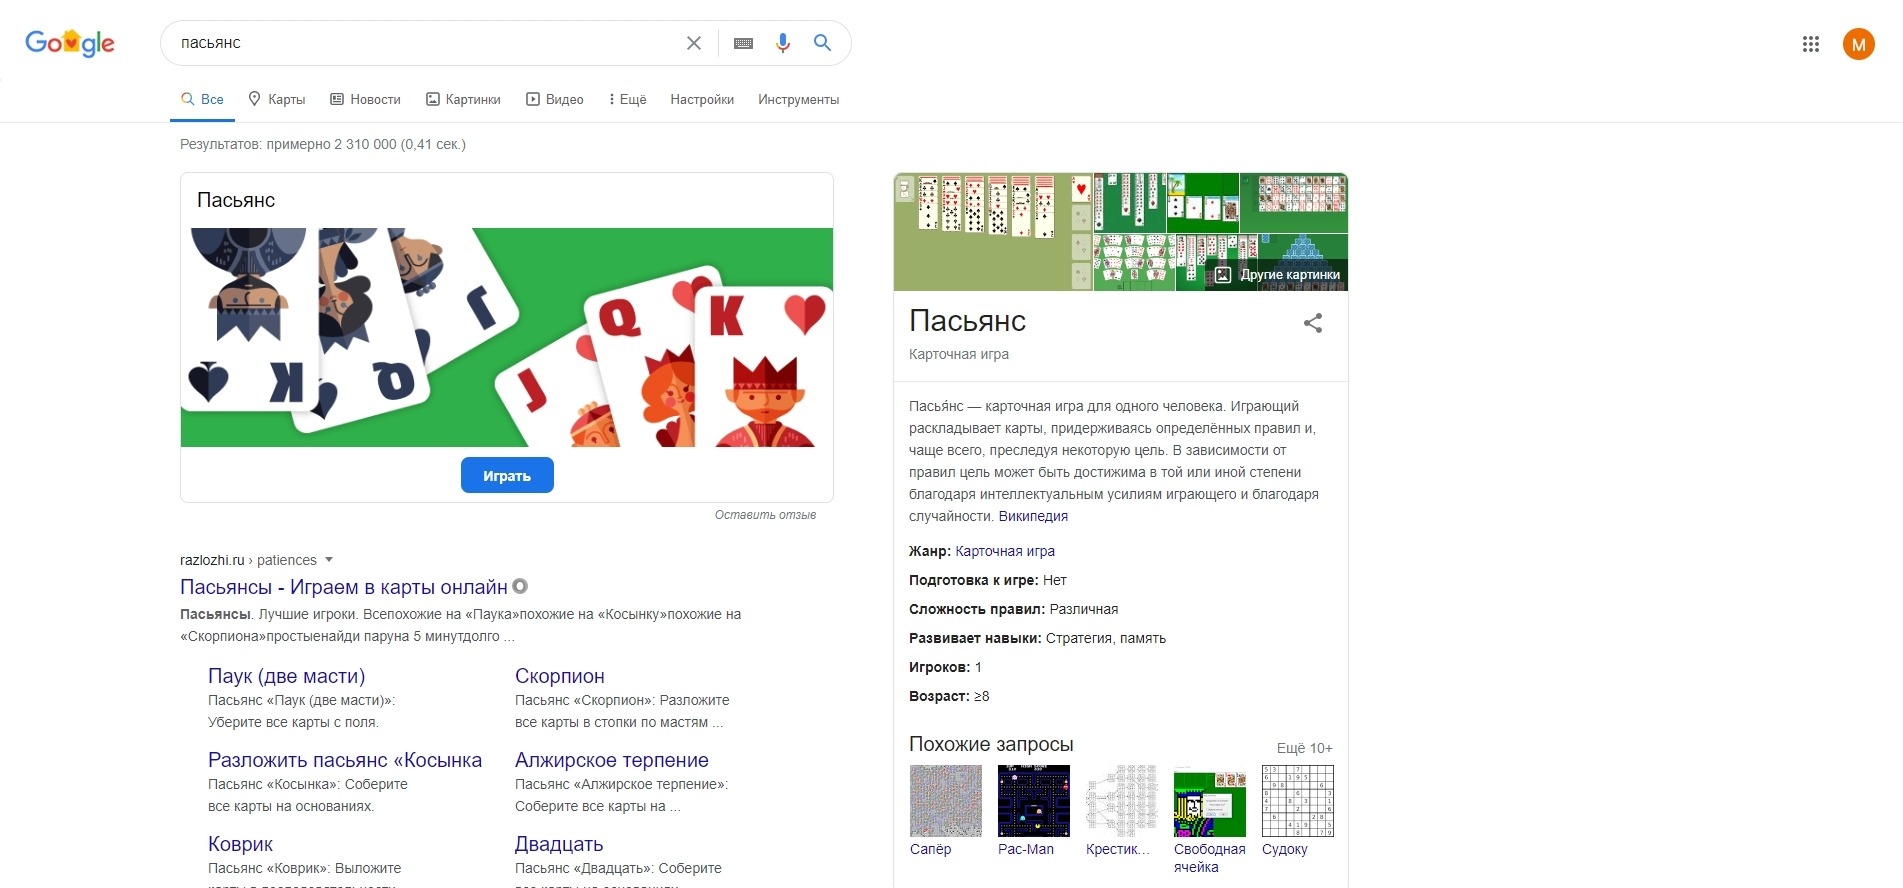 Пасхалки Google: солитёр